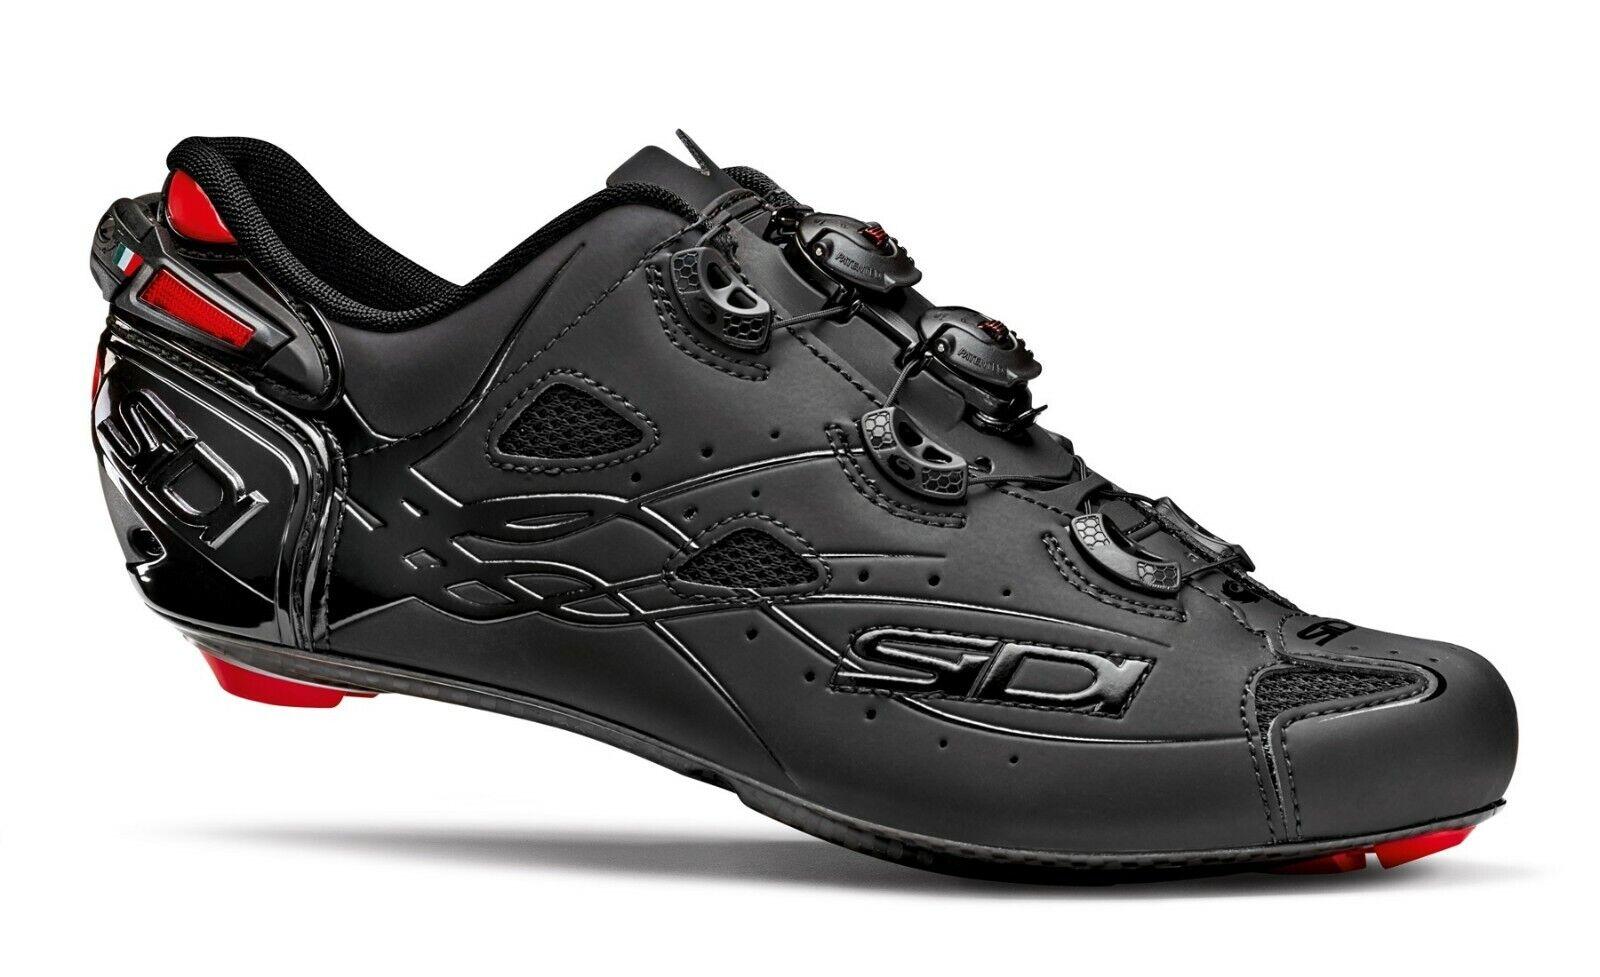 Nuevos Zapatos De Ciclismo Sidi tiro Limitada, Negro Mate total, EU40-45